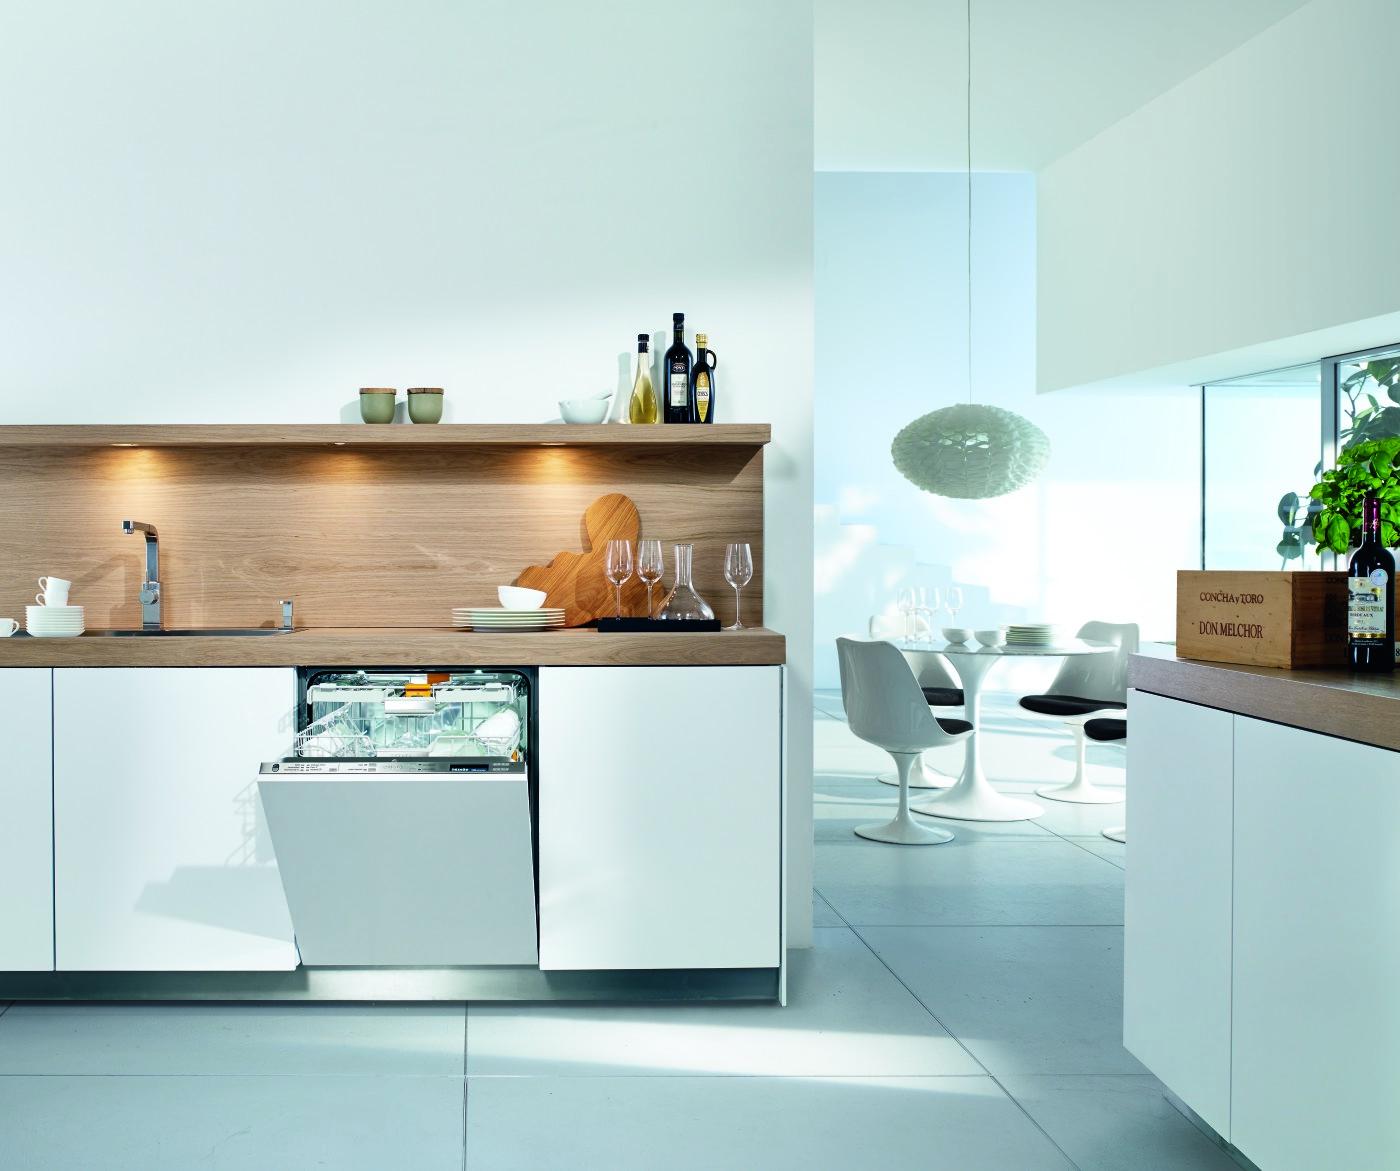 Miele Dishwashers   MieleG 6595 SCVi K2o Lumen Dishwasher